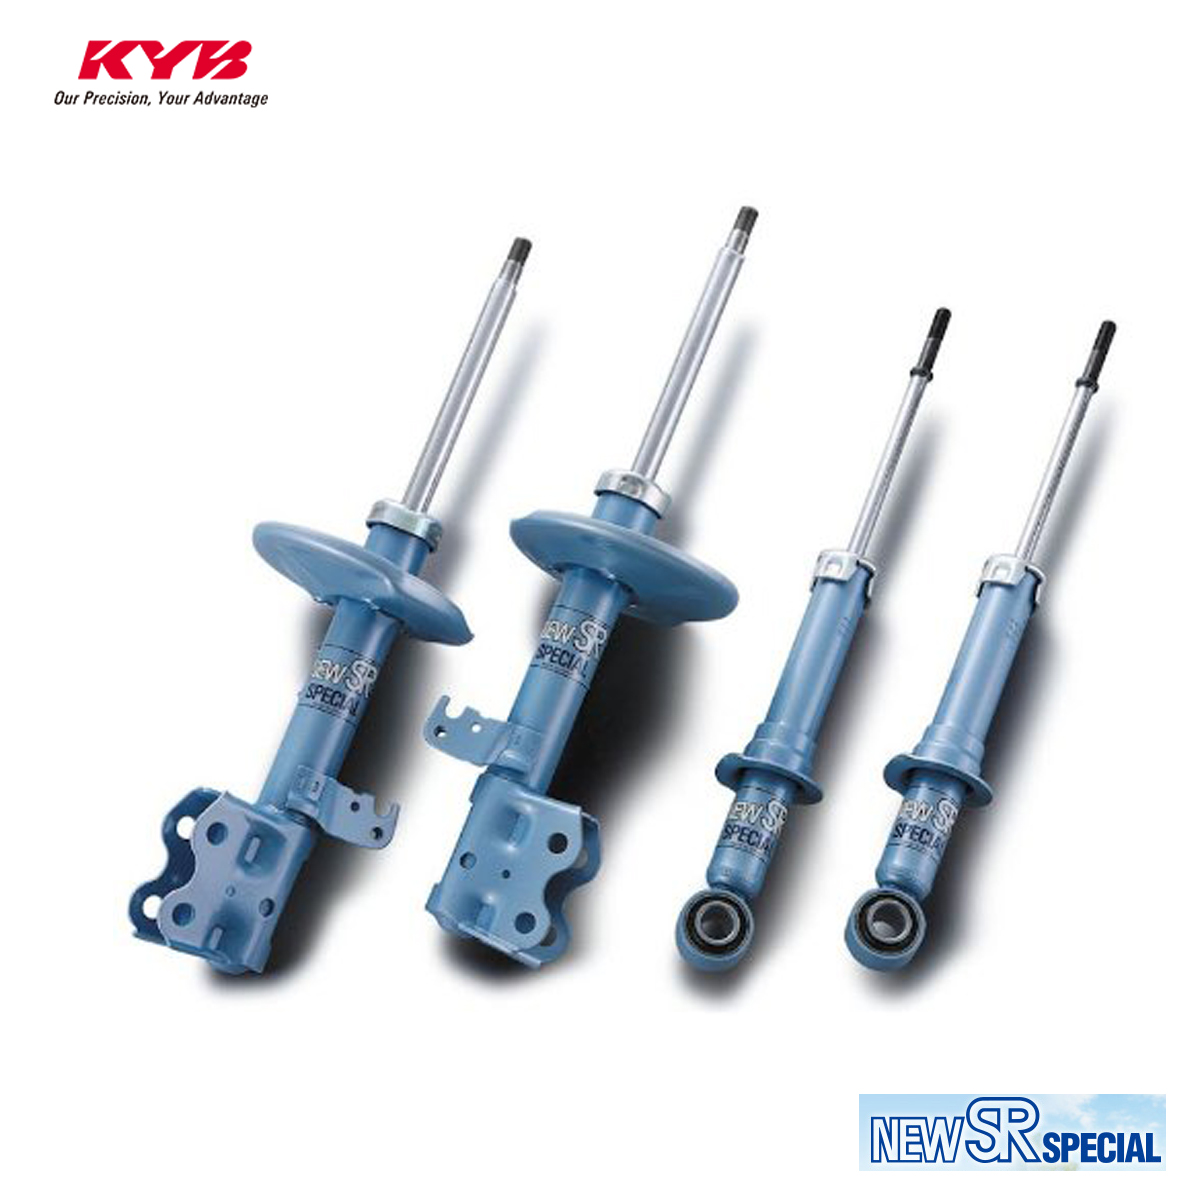 KYB カヤバ サニー スピリット HB12/KHB12/RHB12/WHB12/HB12L ショックアブソーバー リア 右用 1本 NEW SR SPECIAL NST5014R 配送先条件有り